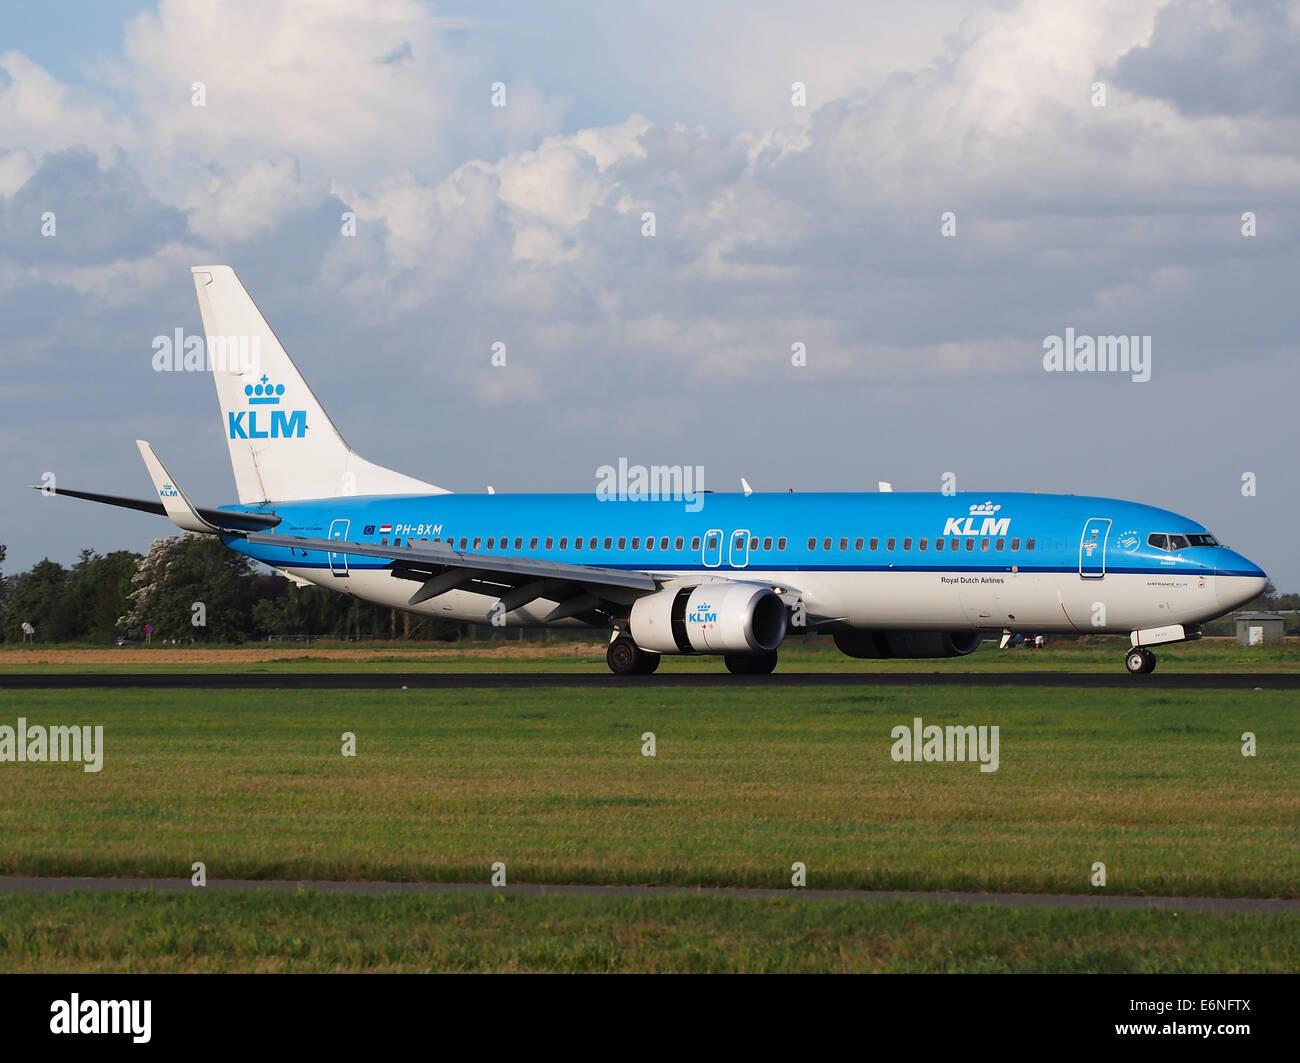 PH BXM KLM Royal Dutch Airlines Boeing 737 8K2WL 11Aug2014 Landing At Schiphol AMS